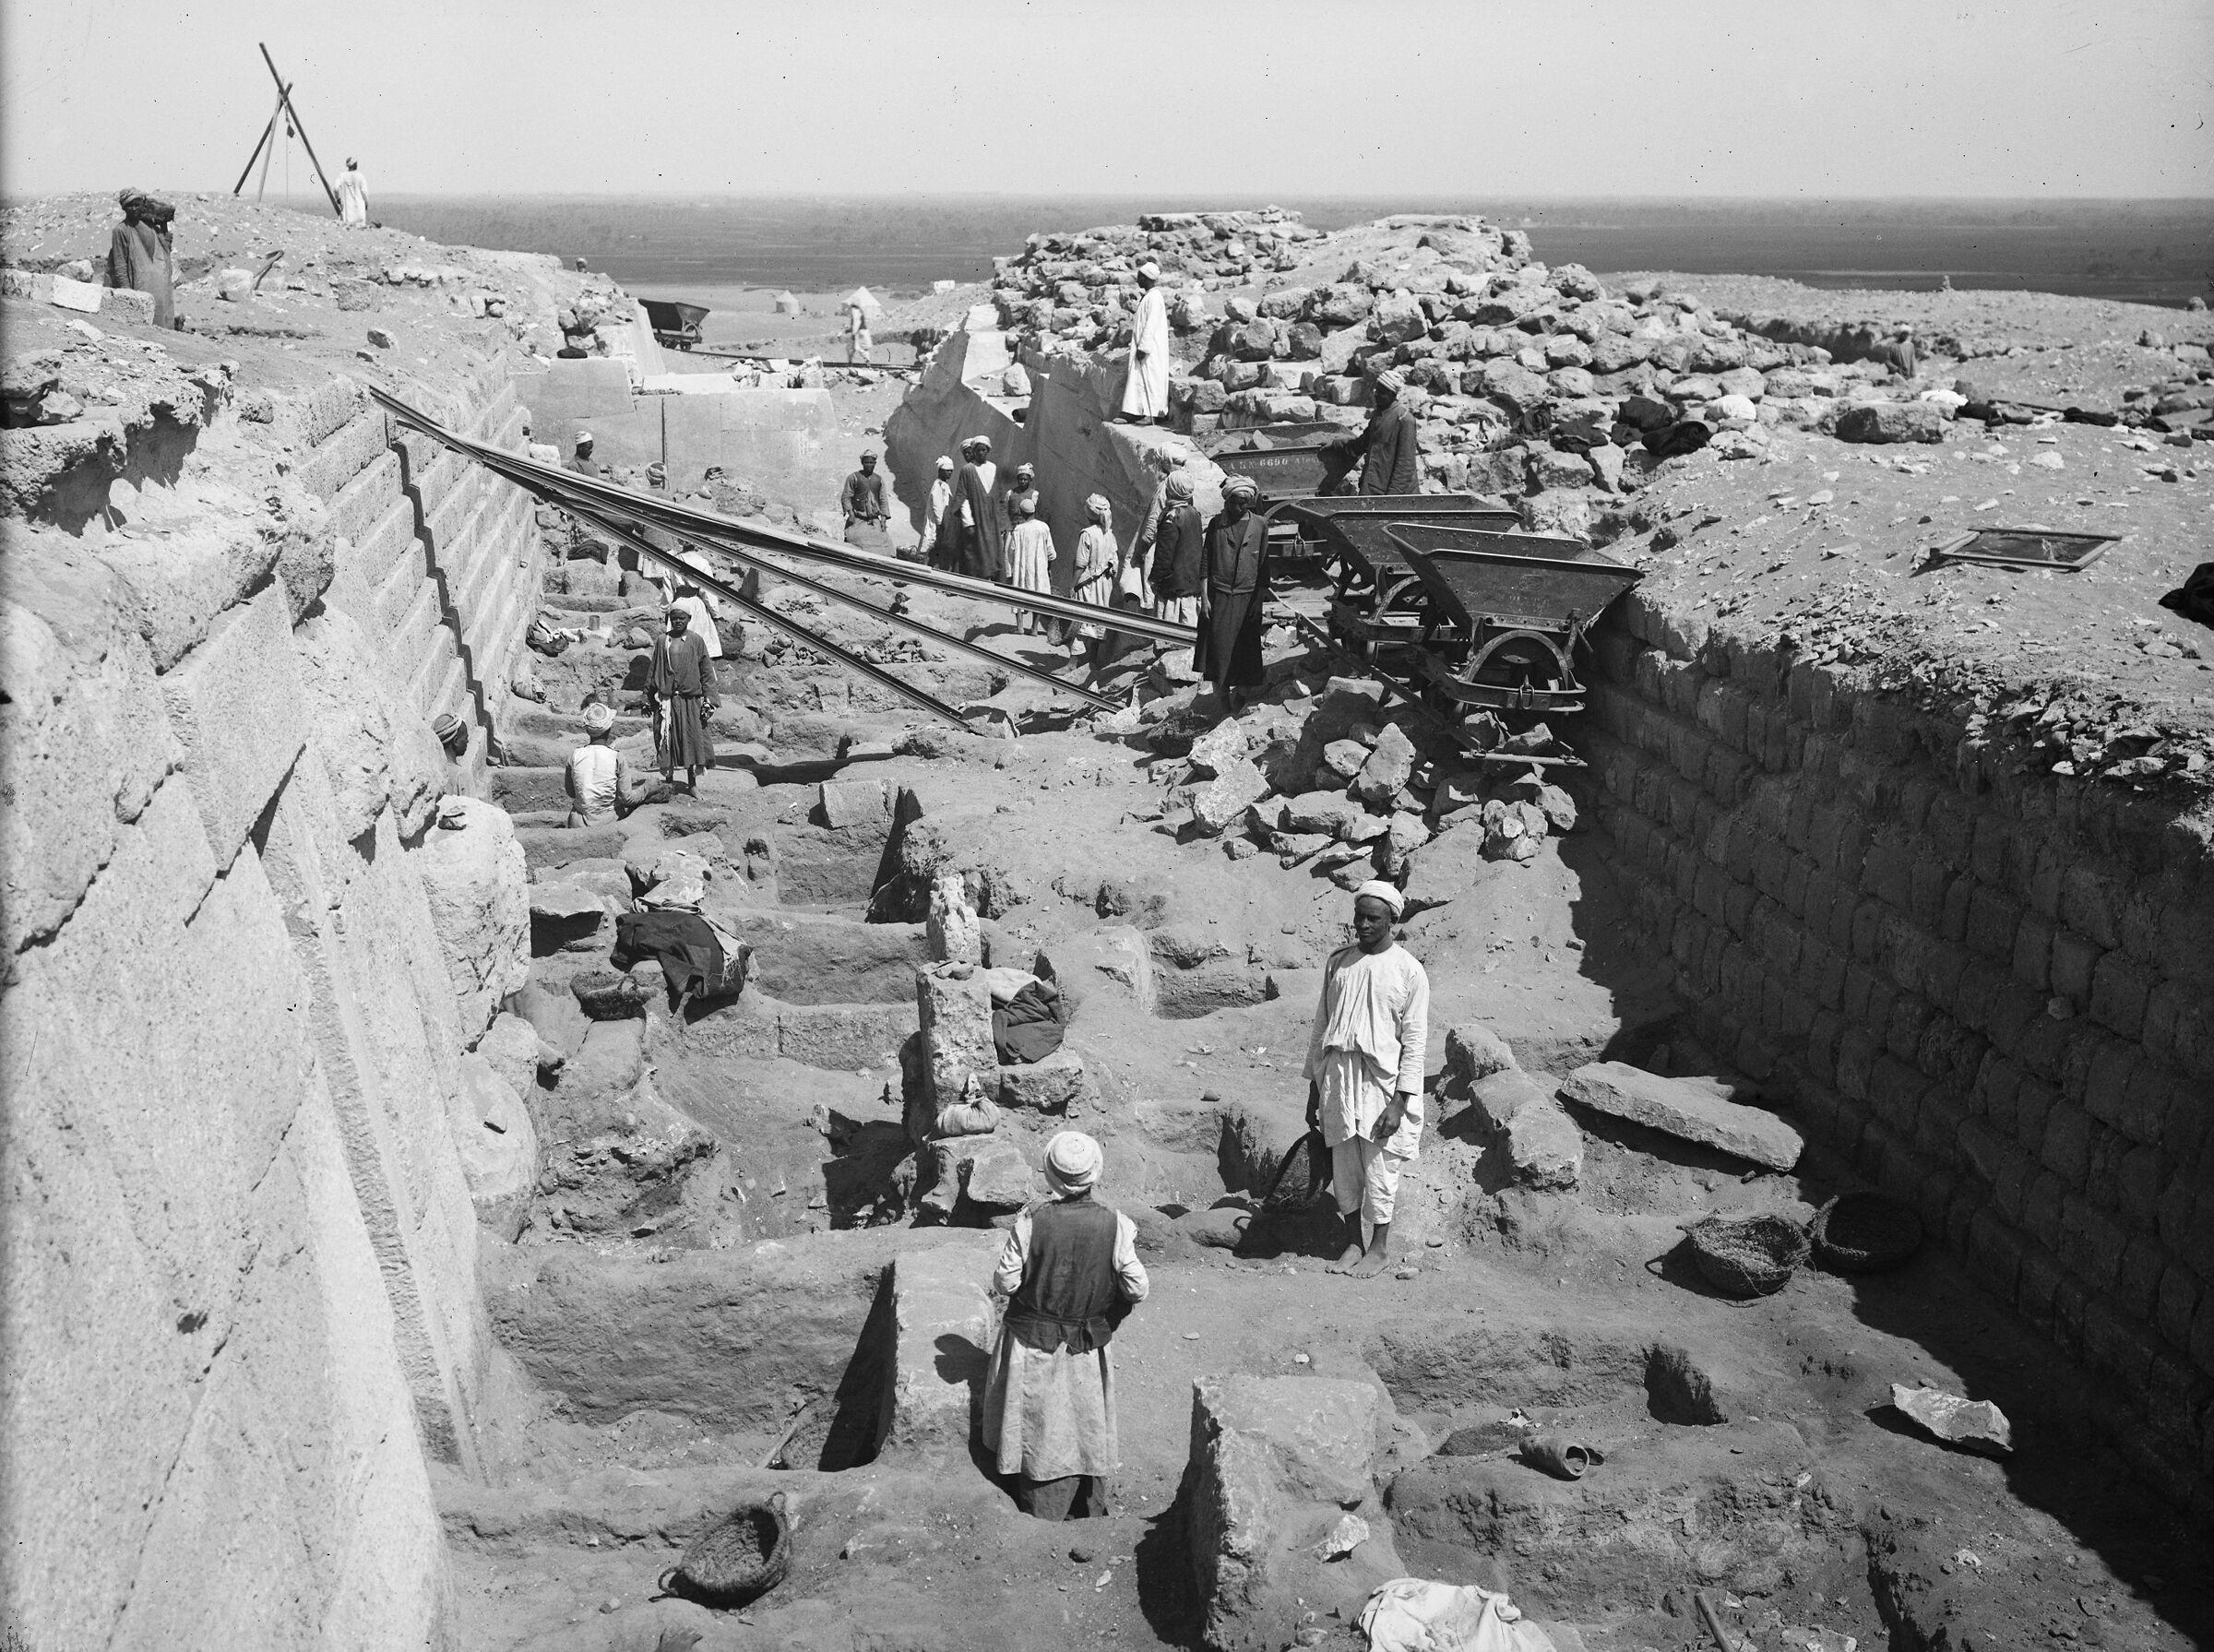 Western Cemetery: Site: Giza; View: G 2100, G 2100-I, G 2120, G 2130, G 2103, G 2104, G 2105